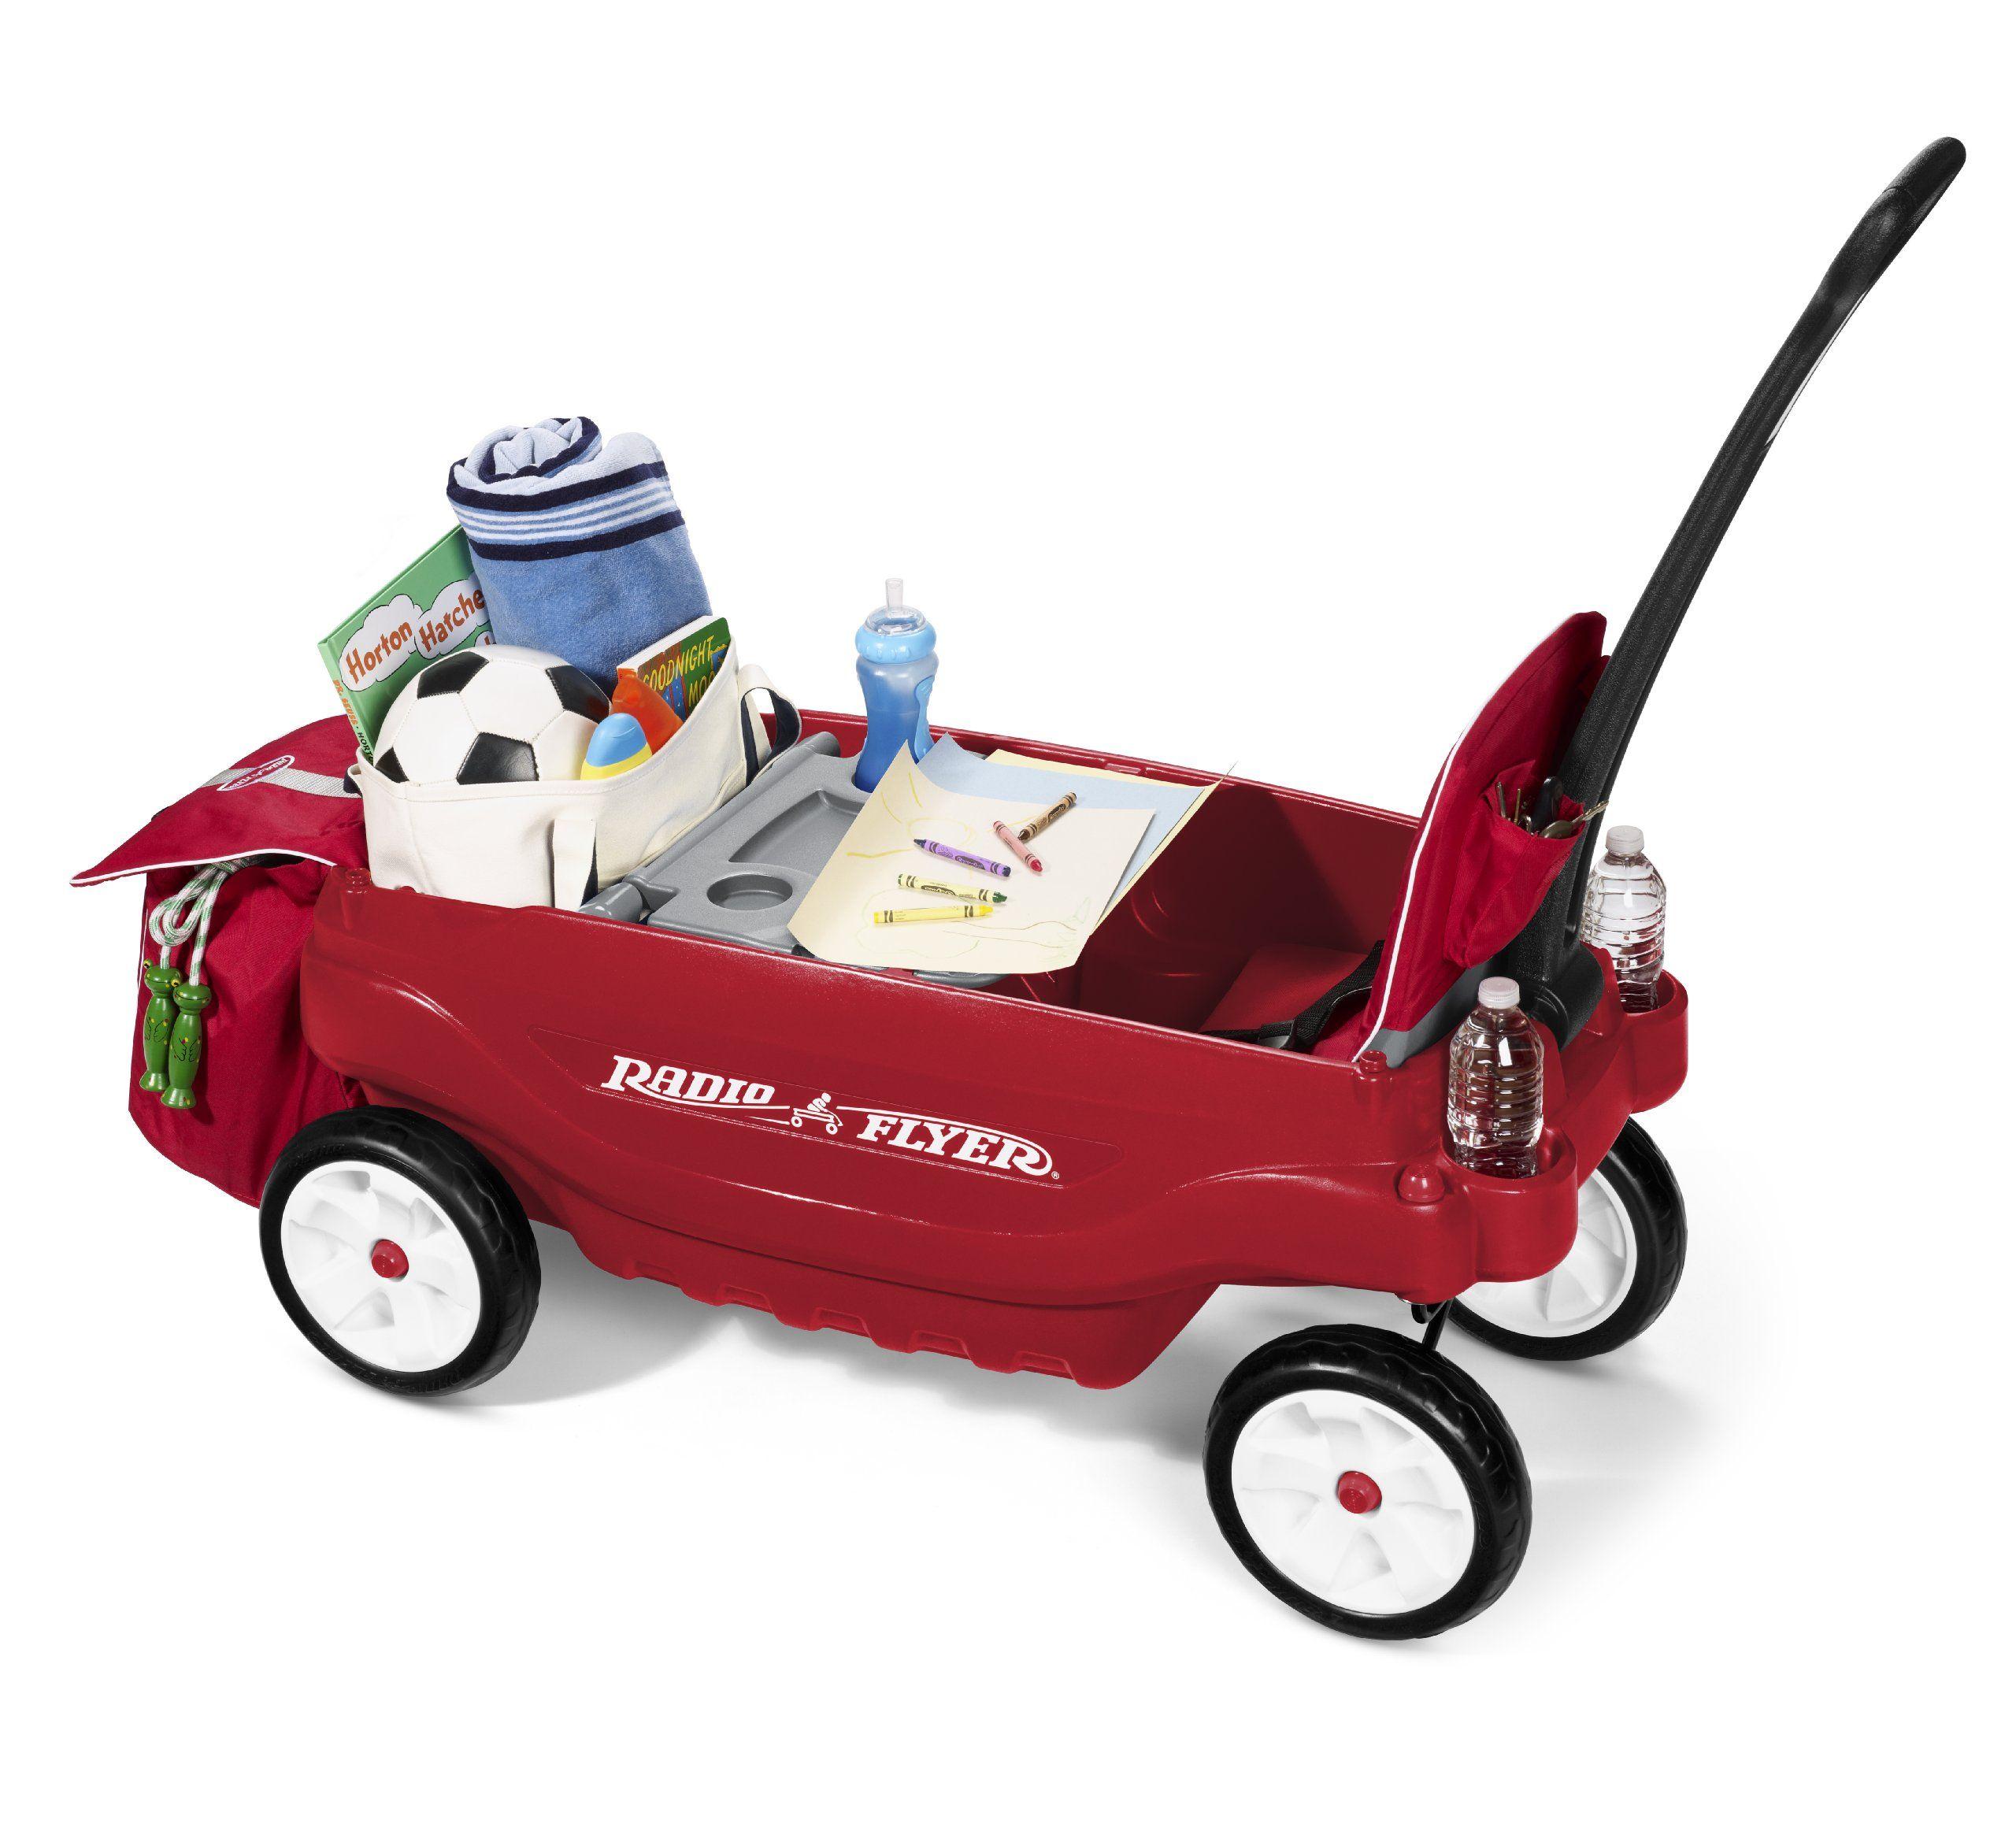 Amazon Com Radio Flyer The Ultimate Comfort Wagon Red Toys Games Radio Flyer Wagons Radio Flyer Birthday Toys